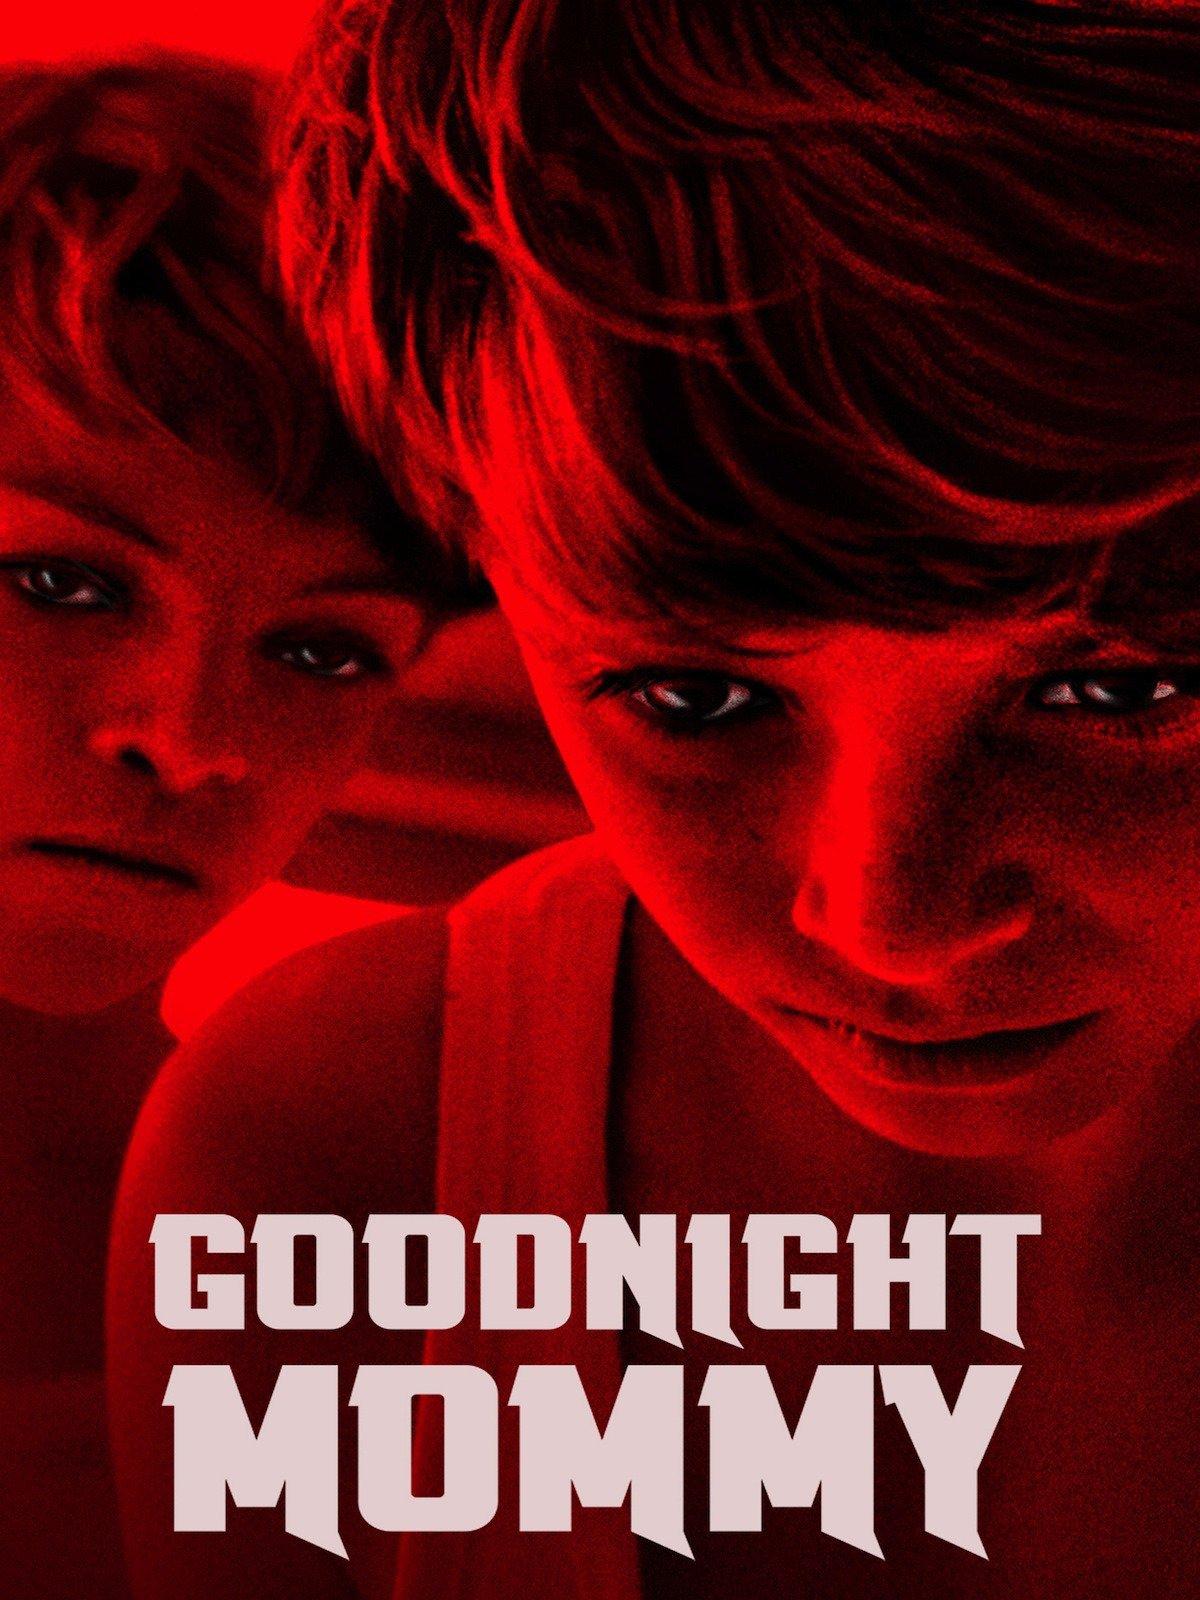 Goodnight Mommy (2015) แม่ครับ…หลับซะเถอะ [มาใหม่ SubThai]